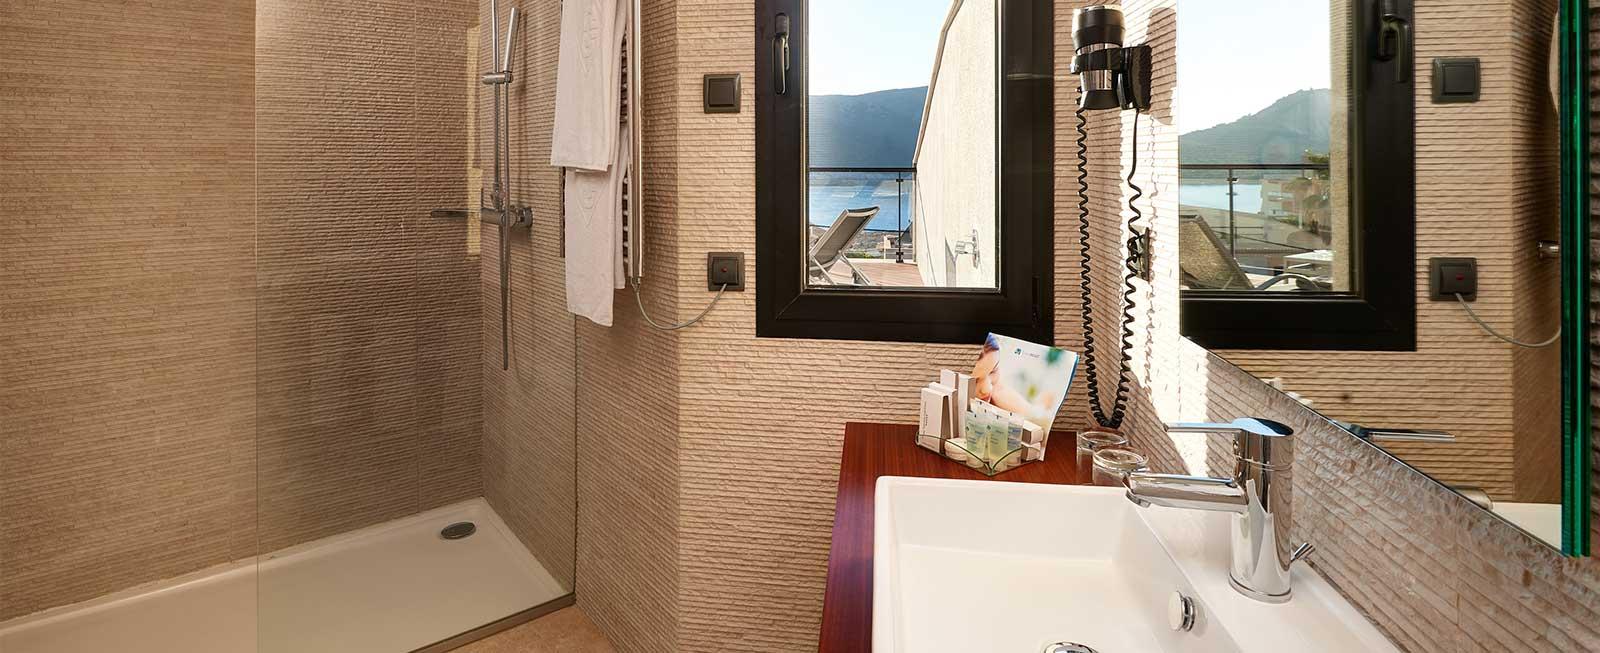 Junior Suite Deluxe Protur Turo Pins Hotel Spa Cala Rajada